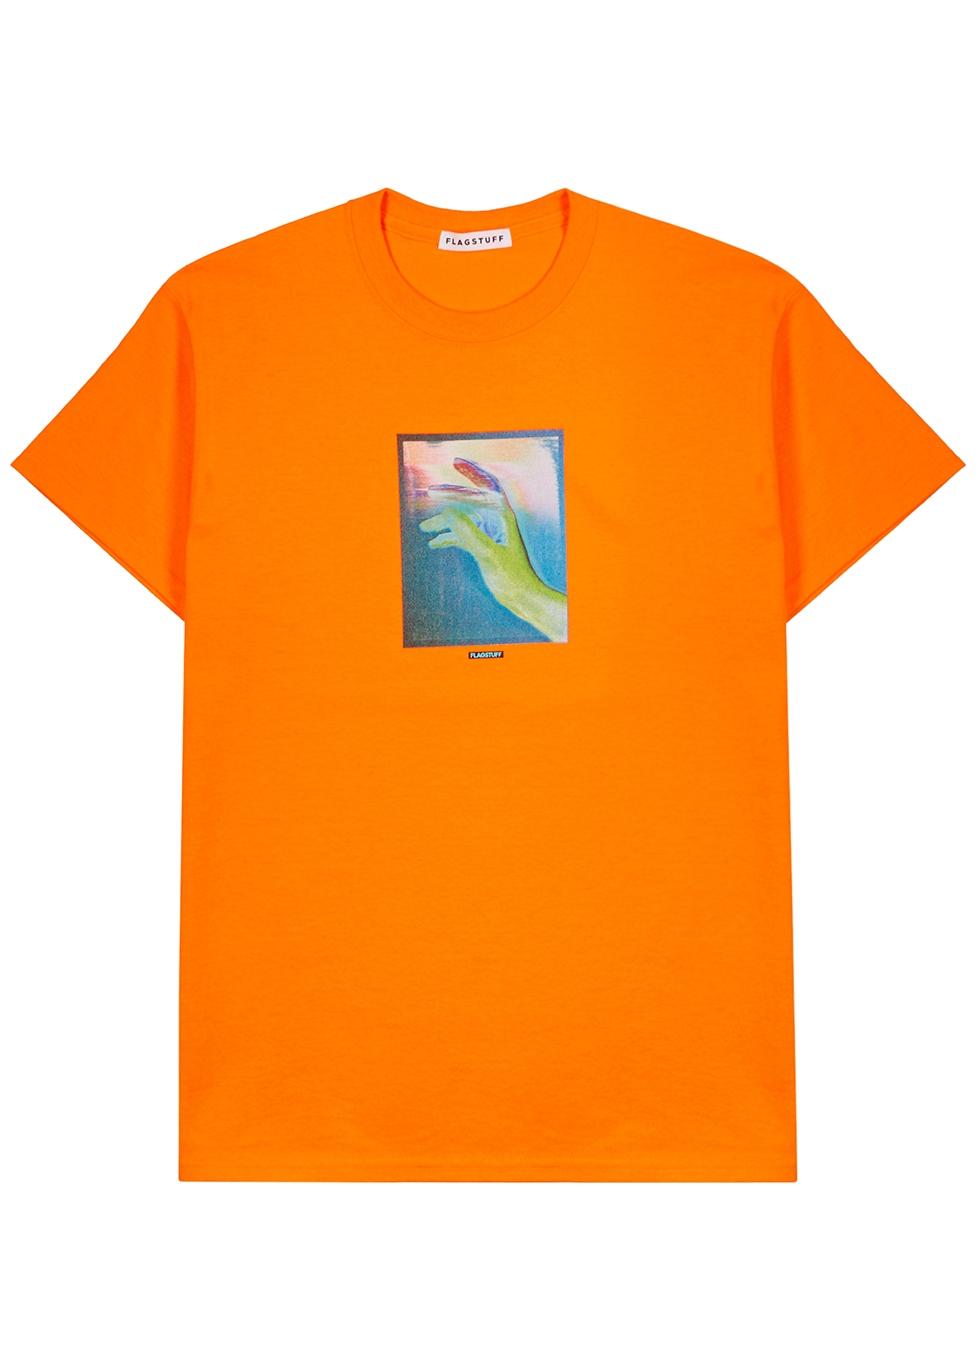 Orange cotton-blend T-shirt - Flagstuff